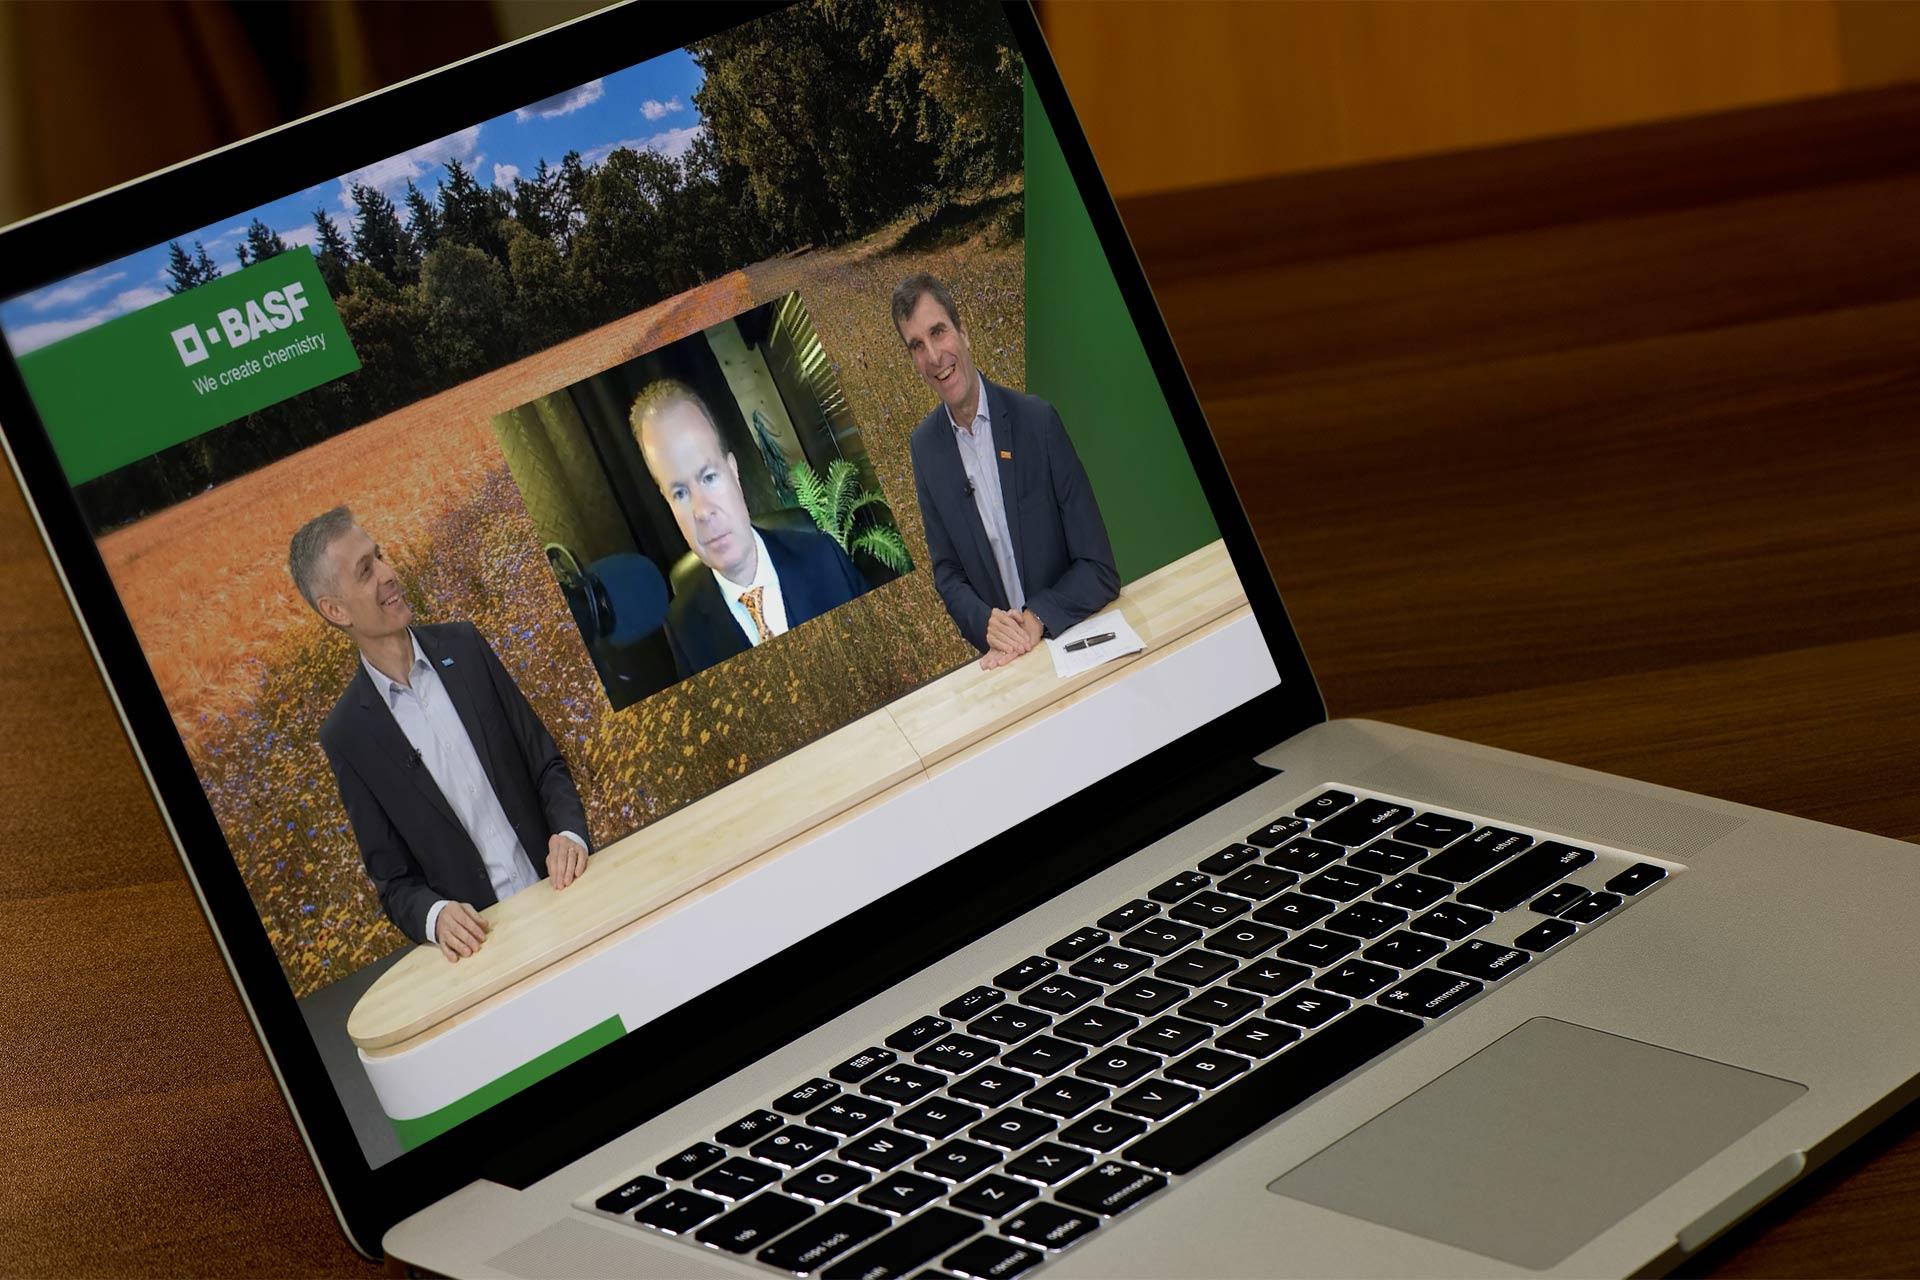 Agentur Ressmann | BASF Agricultural Solutions Livestream EMEA 02